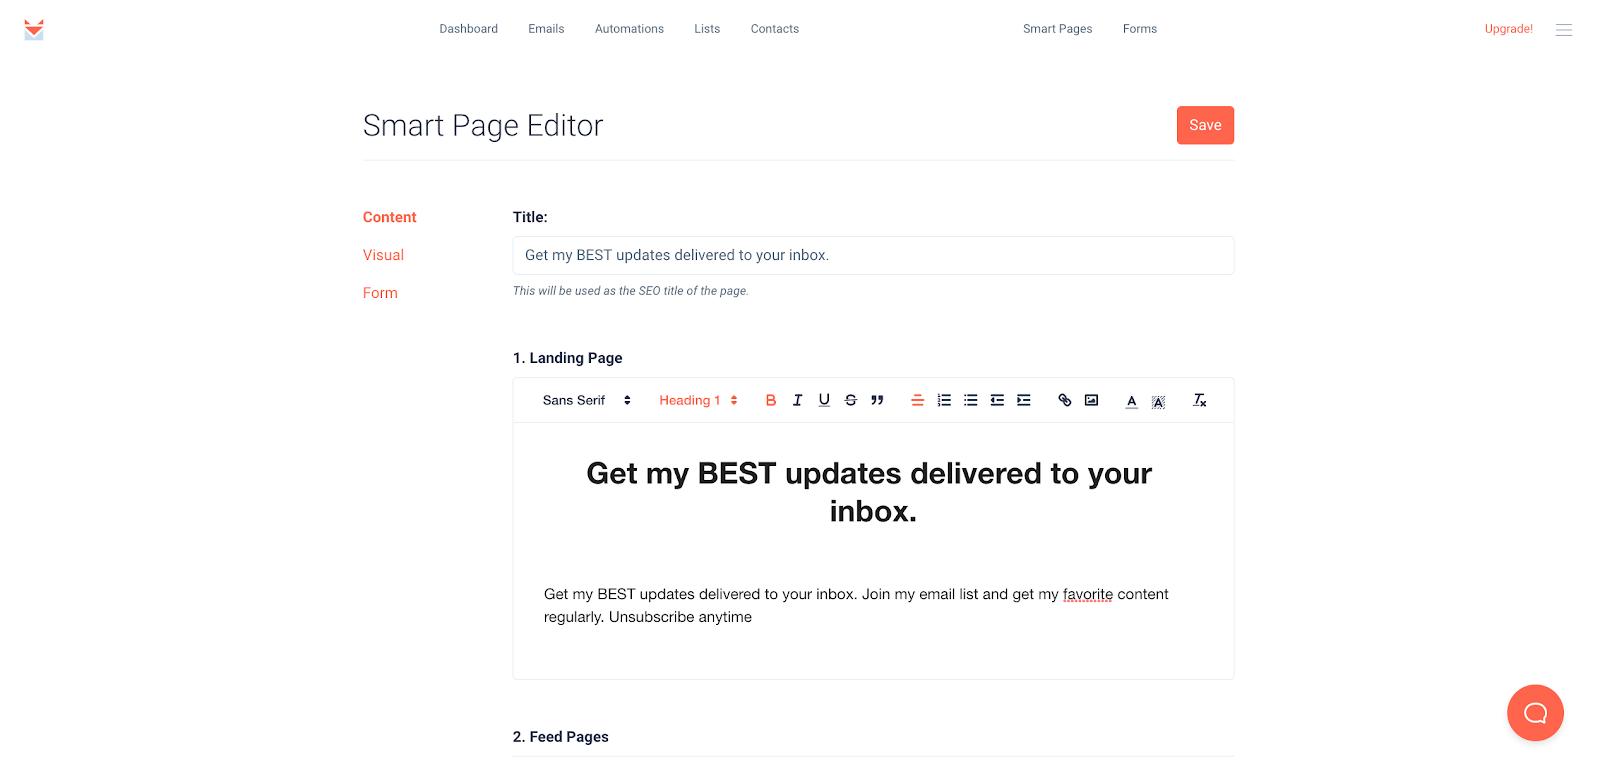 SendFox - Smart Page Editor